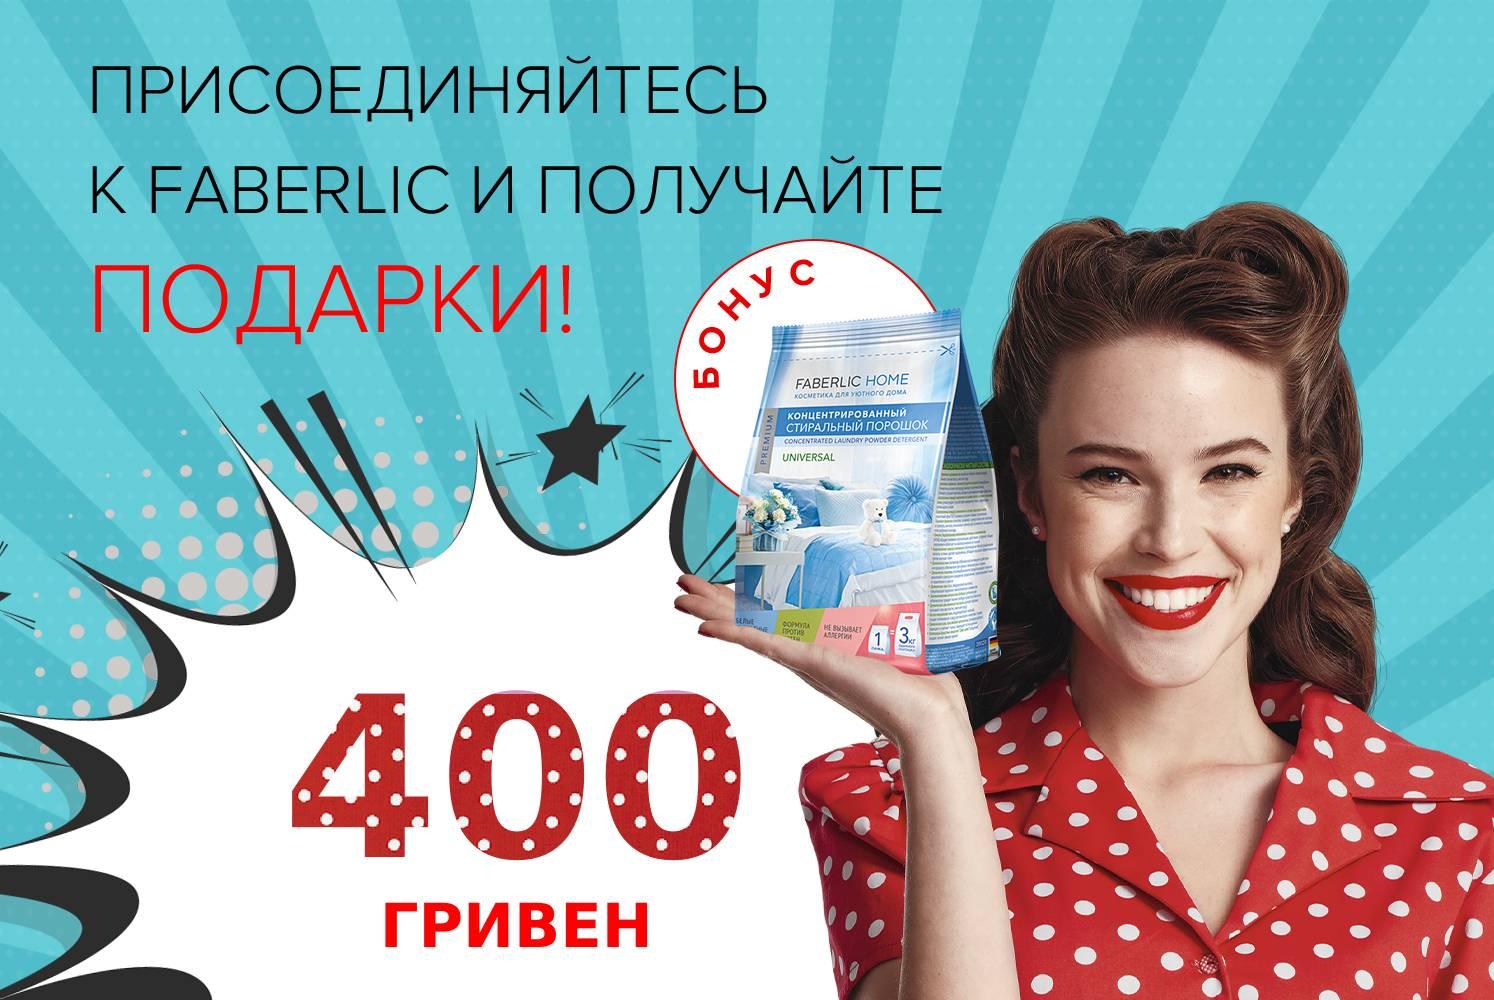 Start-1494-1000-14-2020